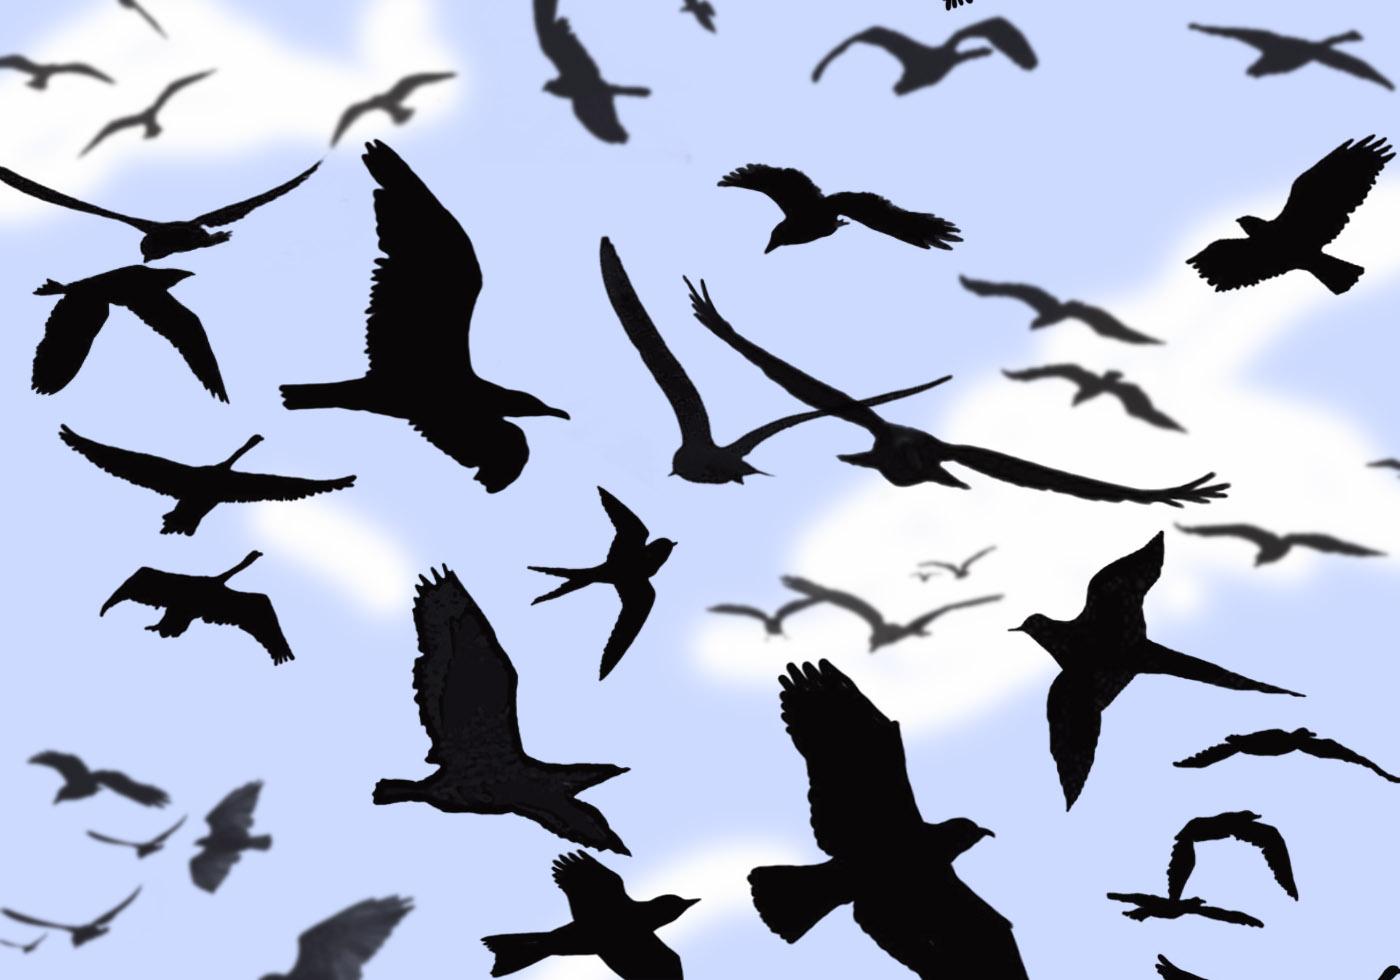 Car Radio Wallpaper Twenty One Pilots Bird Photoshop Brushes Free Photoshop Brushes At Brusheezy